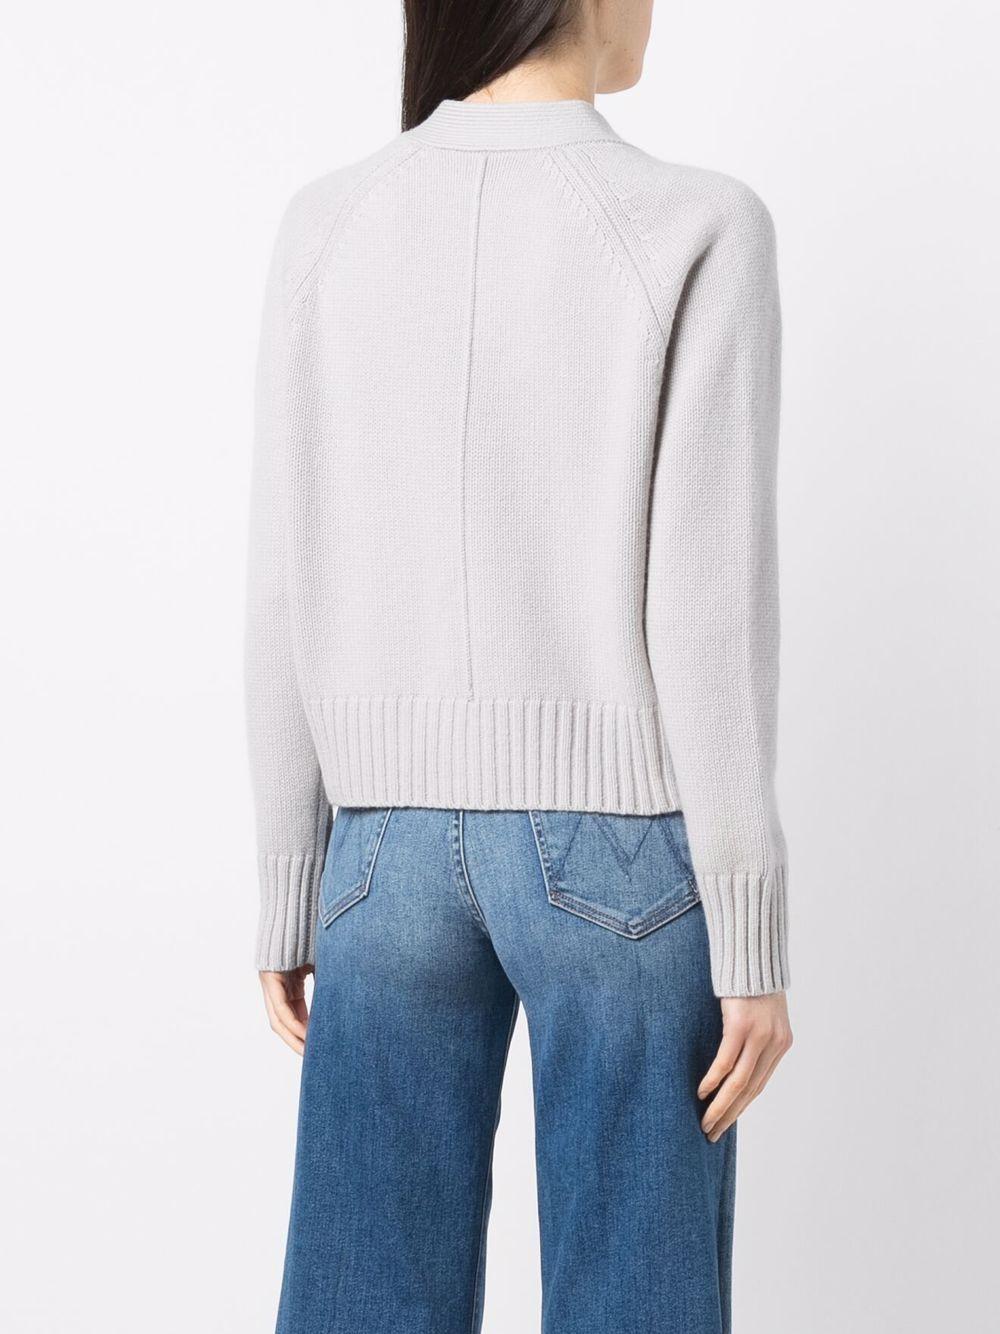 Grey cashmere pouch-pocket v-neck cardigan  ALLUDE |  | 215/1125082